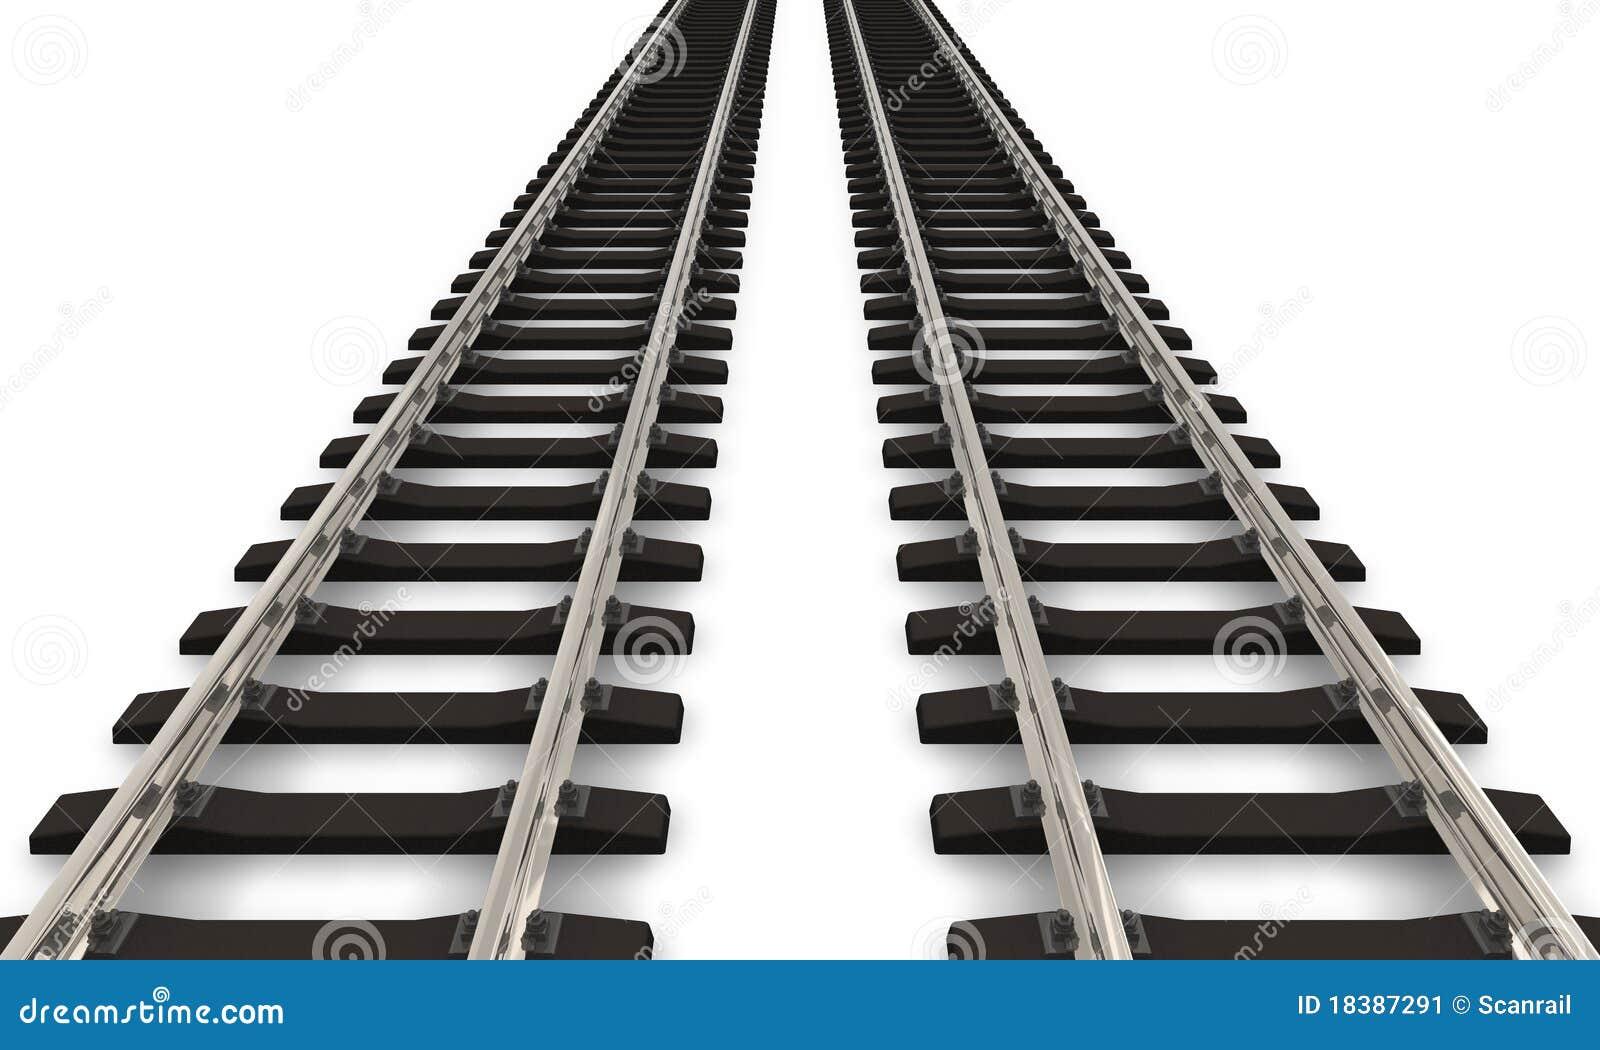 railroad tracks stock illustrations 708 railroad tracks stock rh dreamstime com Railroad Track Clip Art Black and White railroad tracks clipart black and white